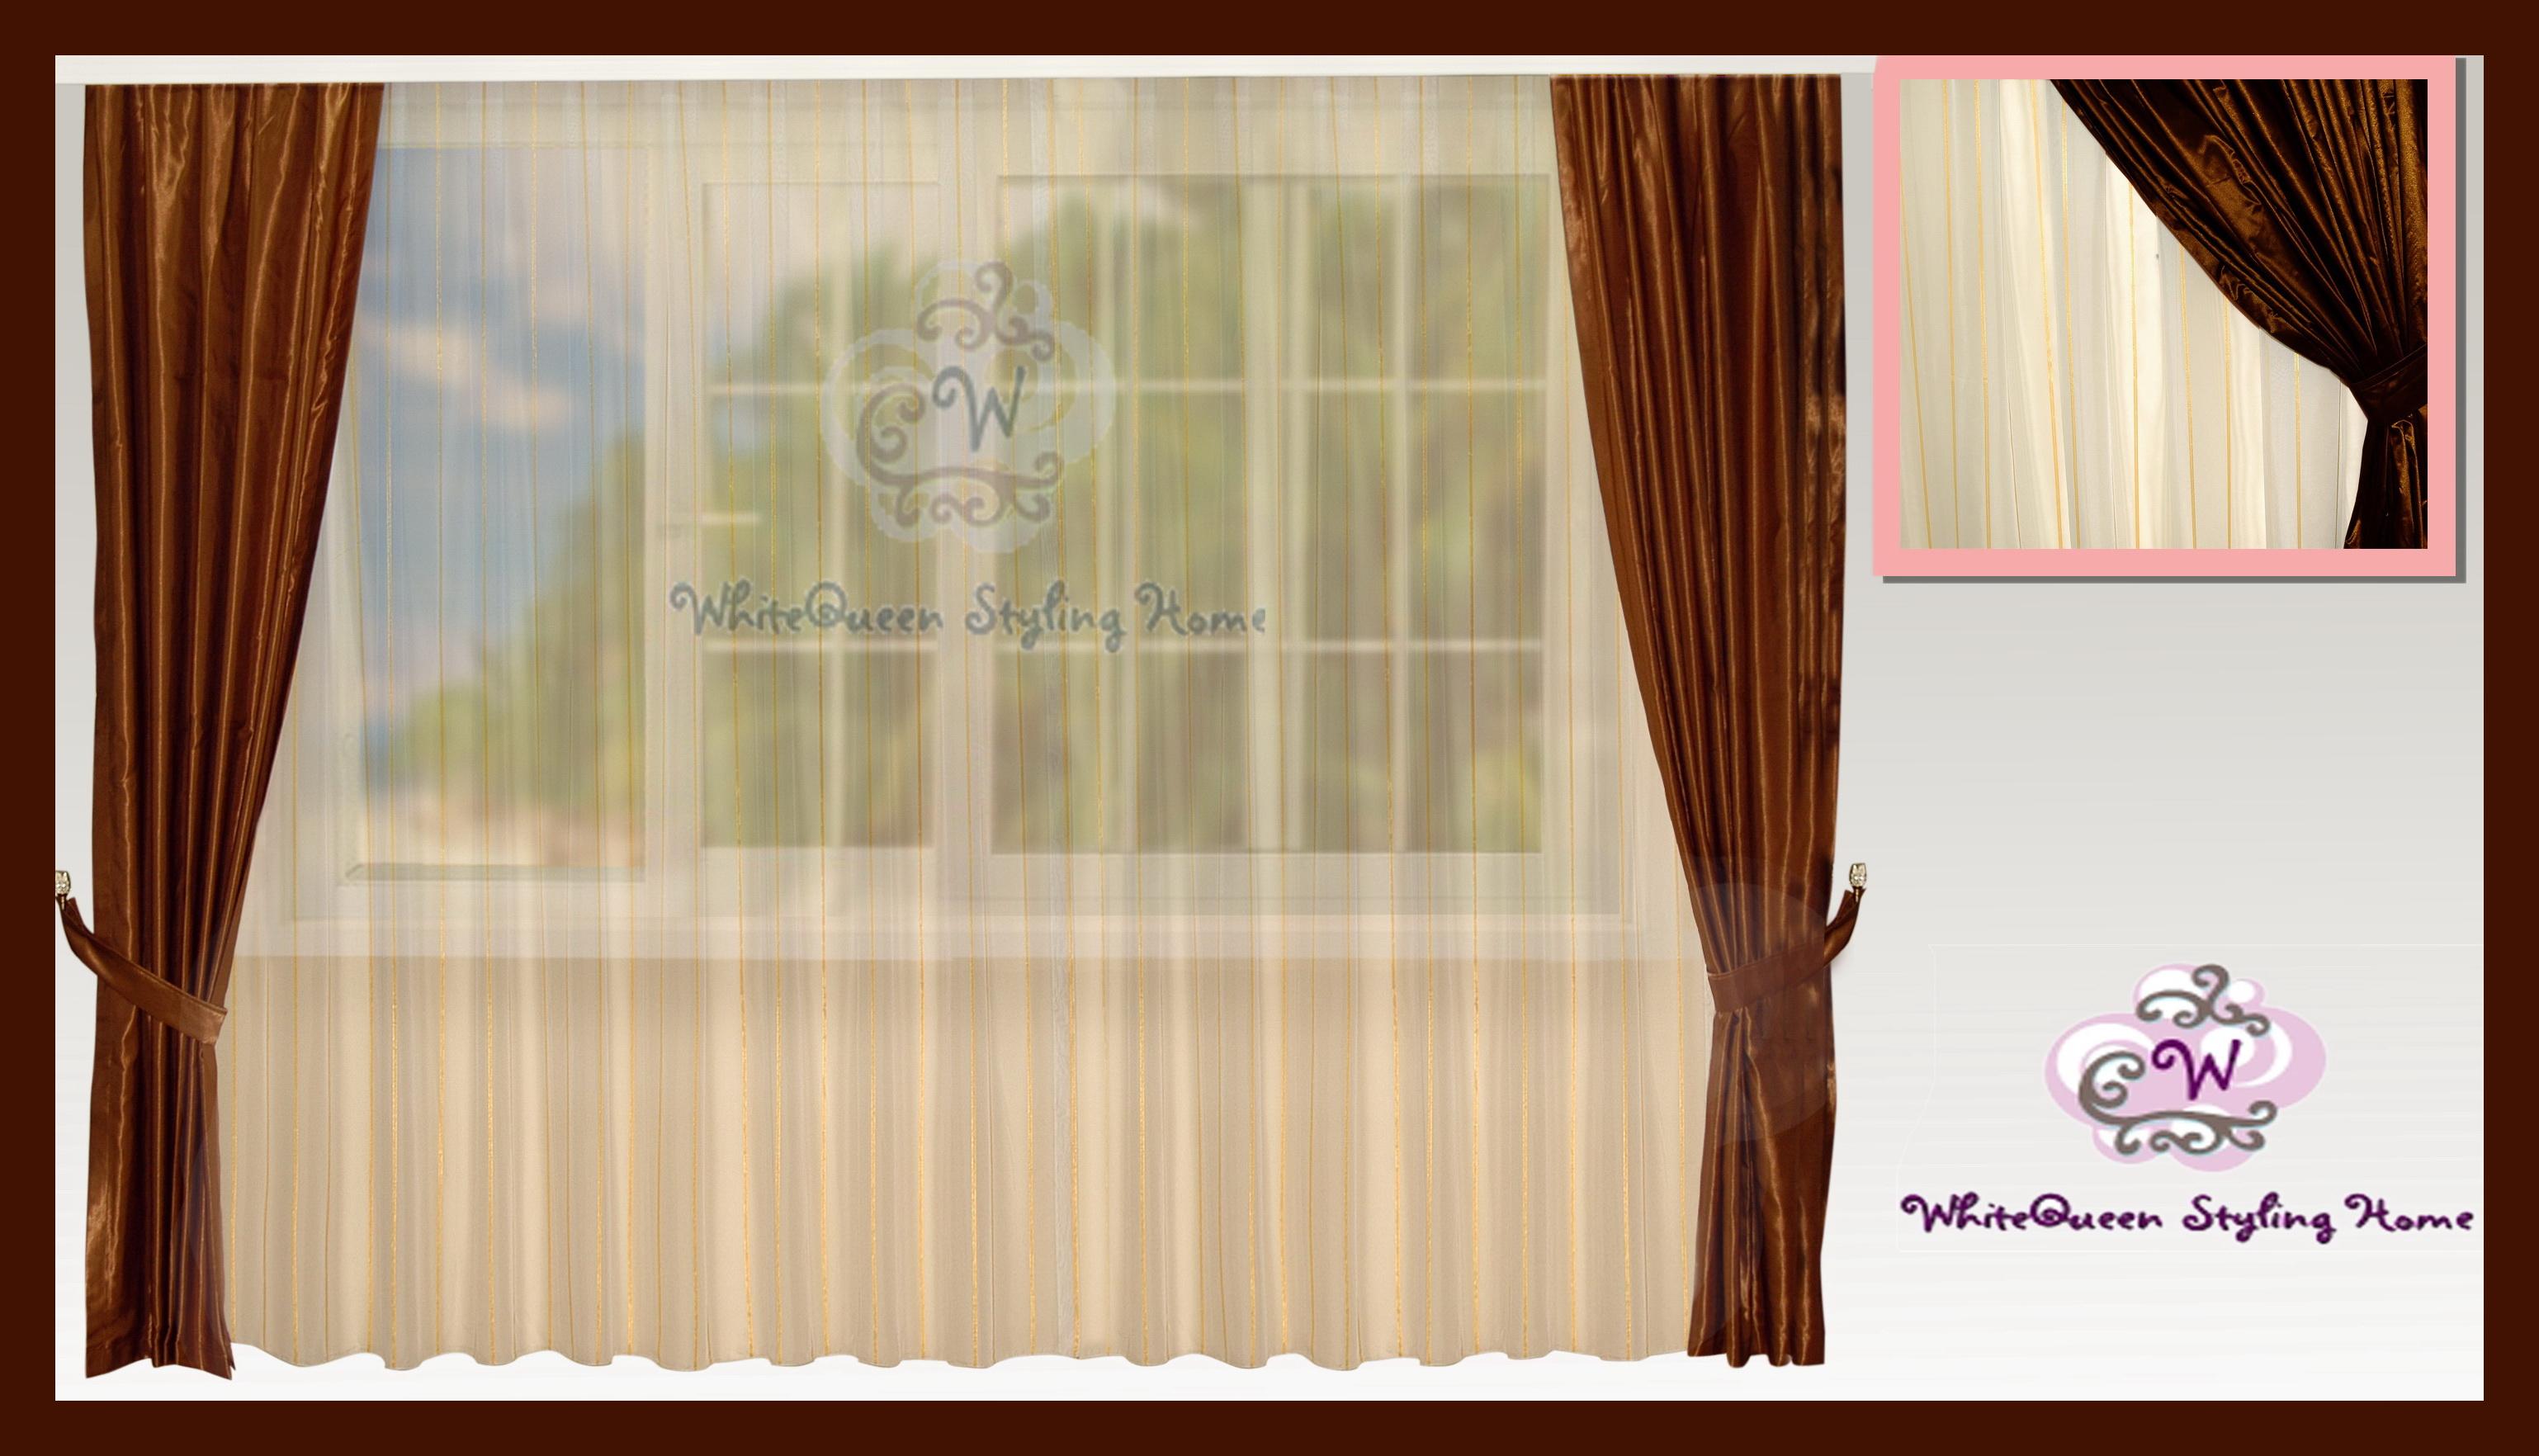 Gardinen deko edle gardinen vorh nge gardinen for Edle dekoration